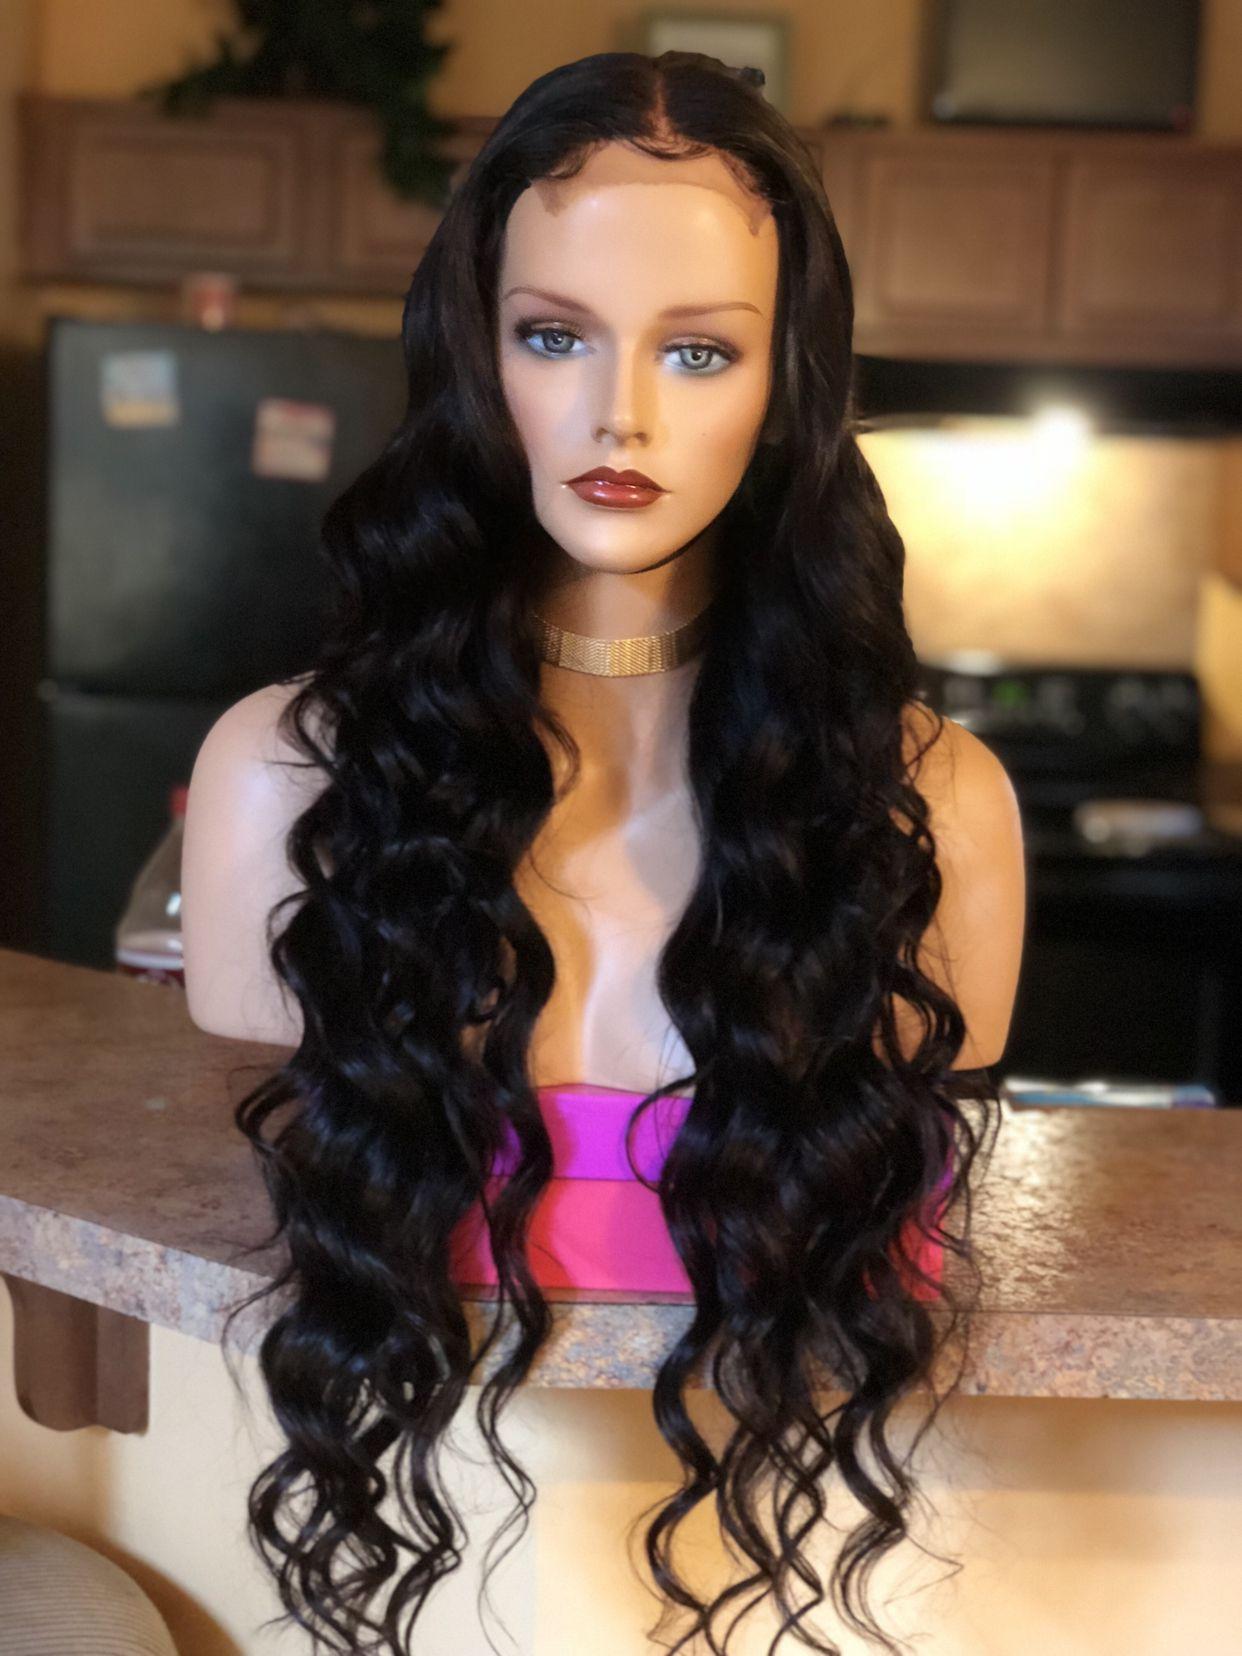 0da92776694 28 inches of hairrr 😍😍😍 Custom unit made with 4 bundles & a ...